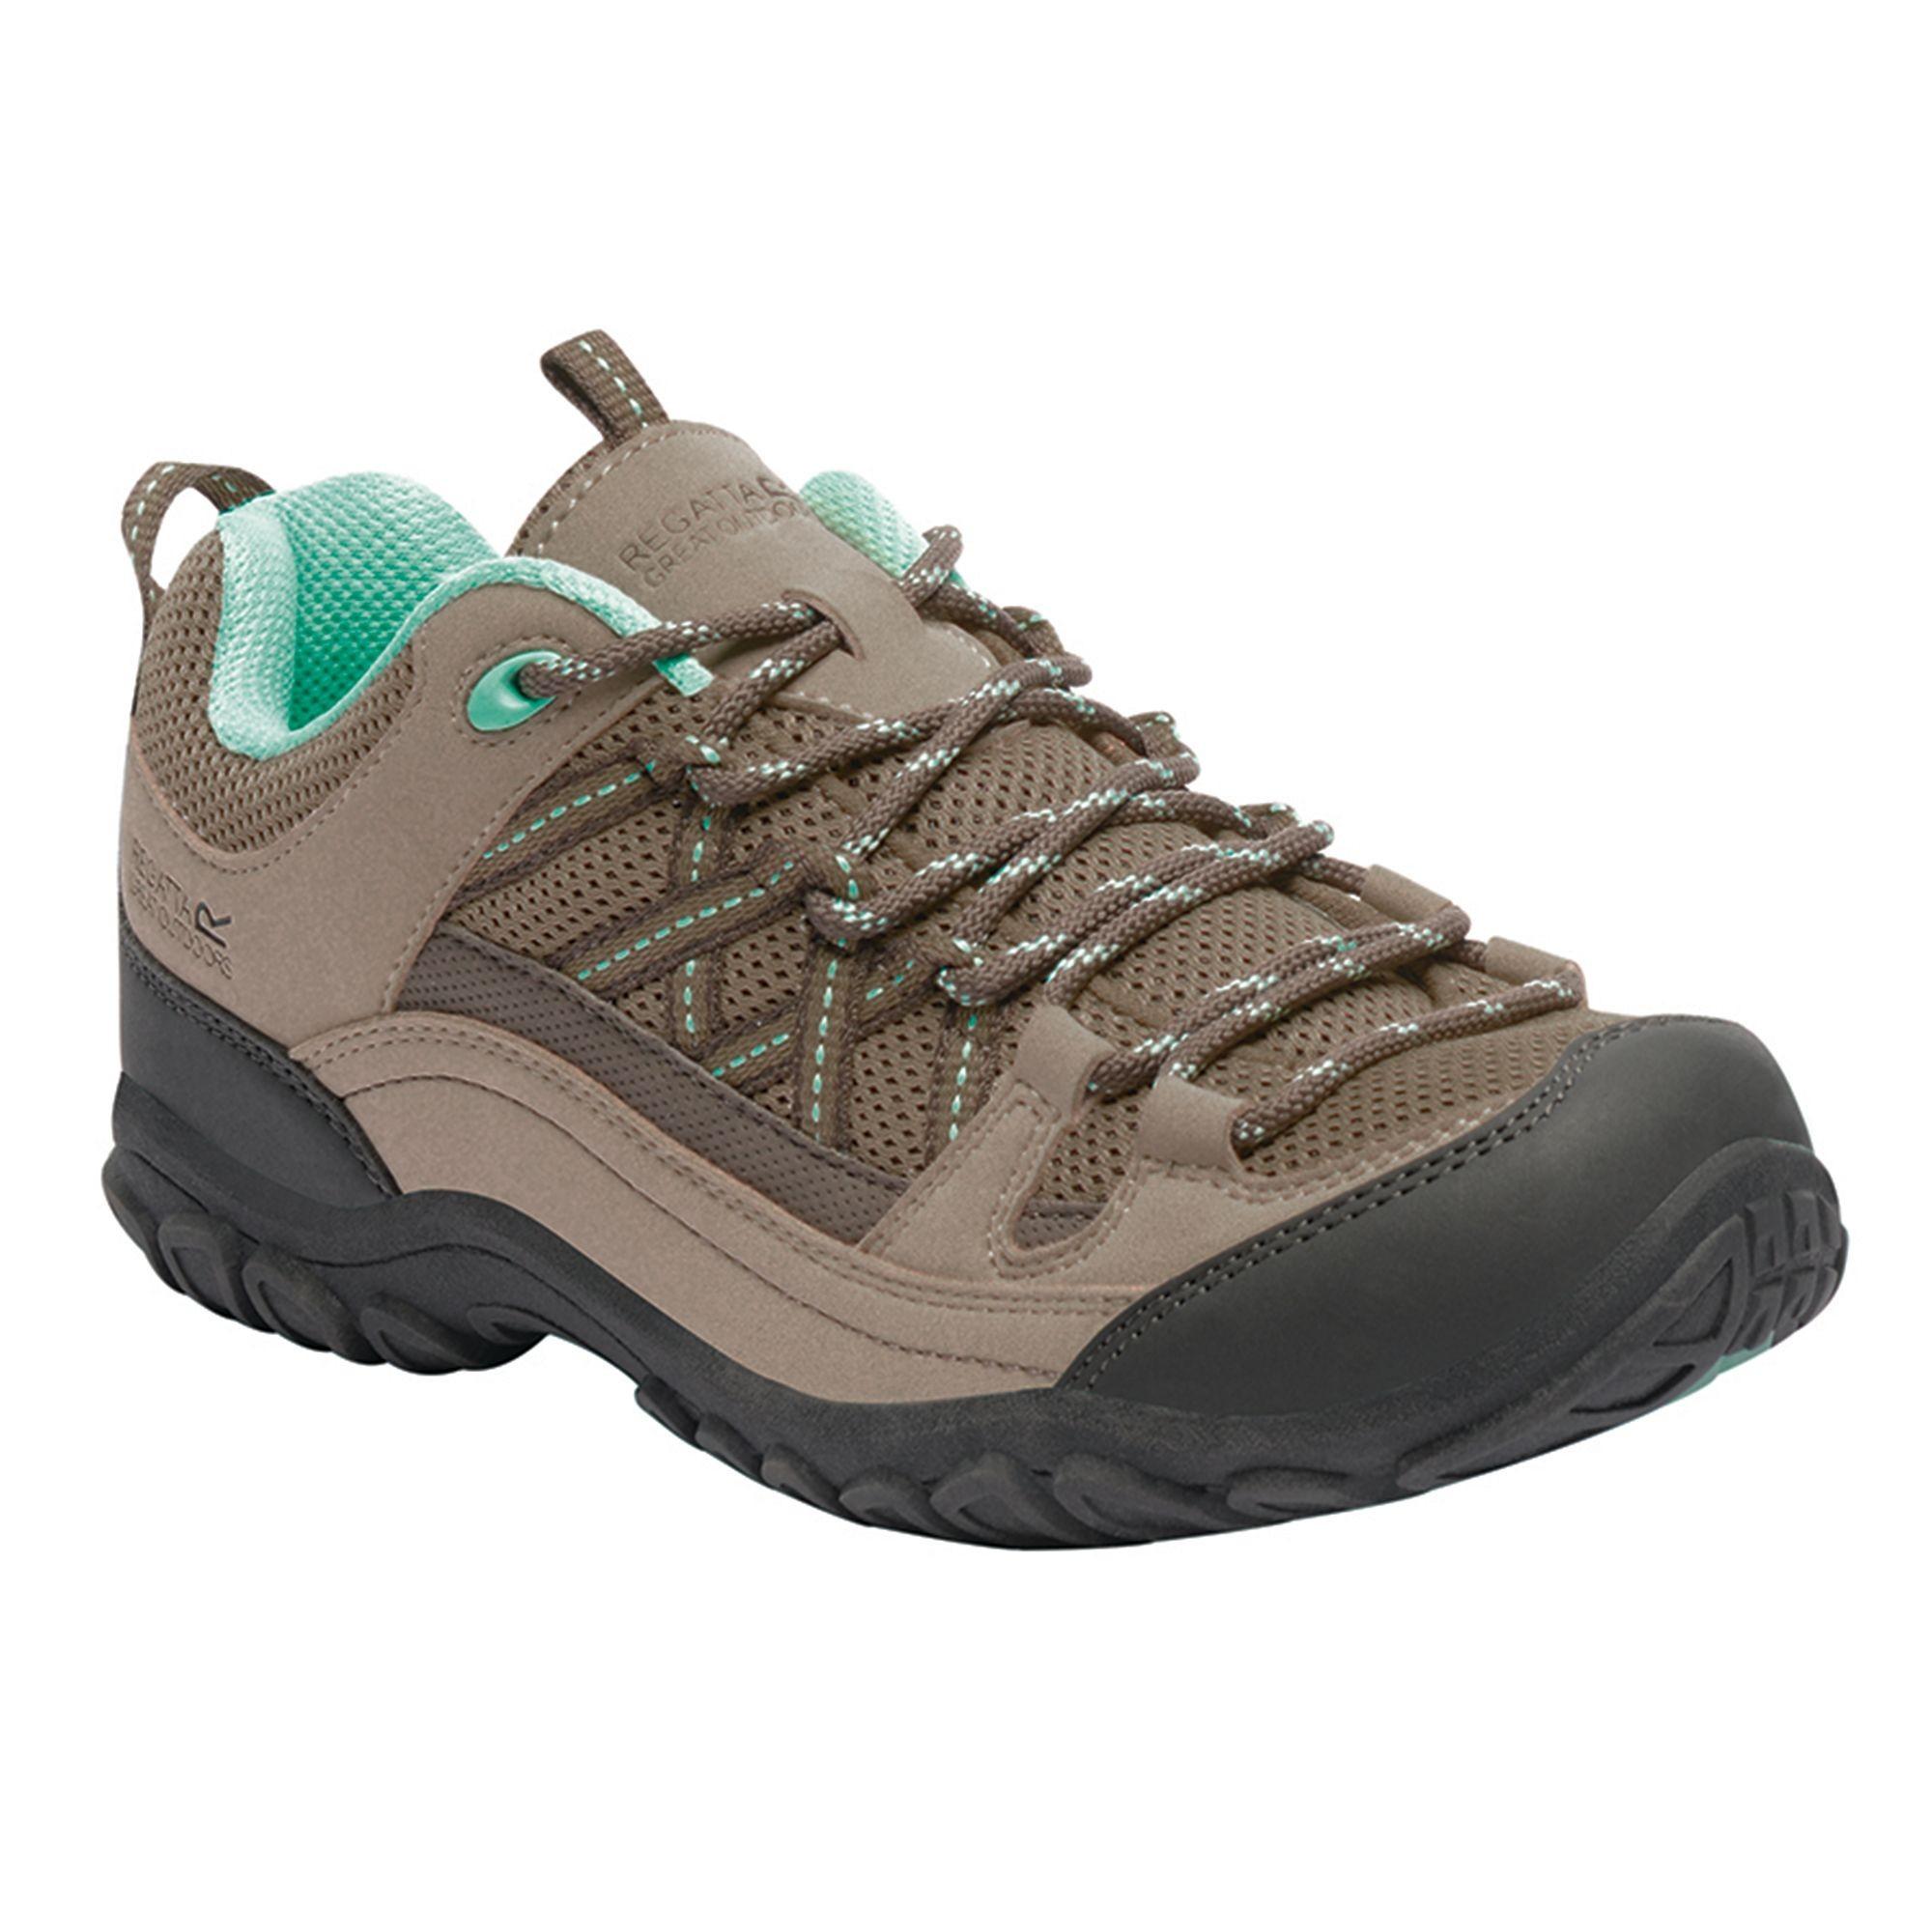 Regatta Womens Edgepoint Walking Shoes